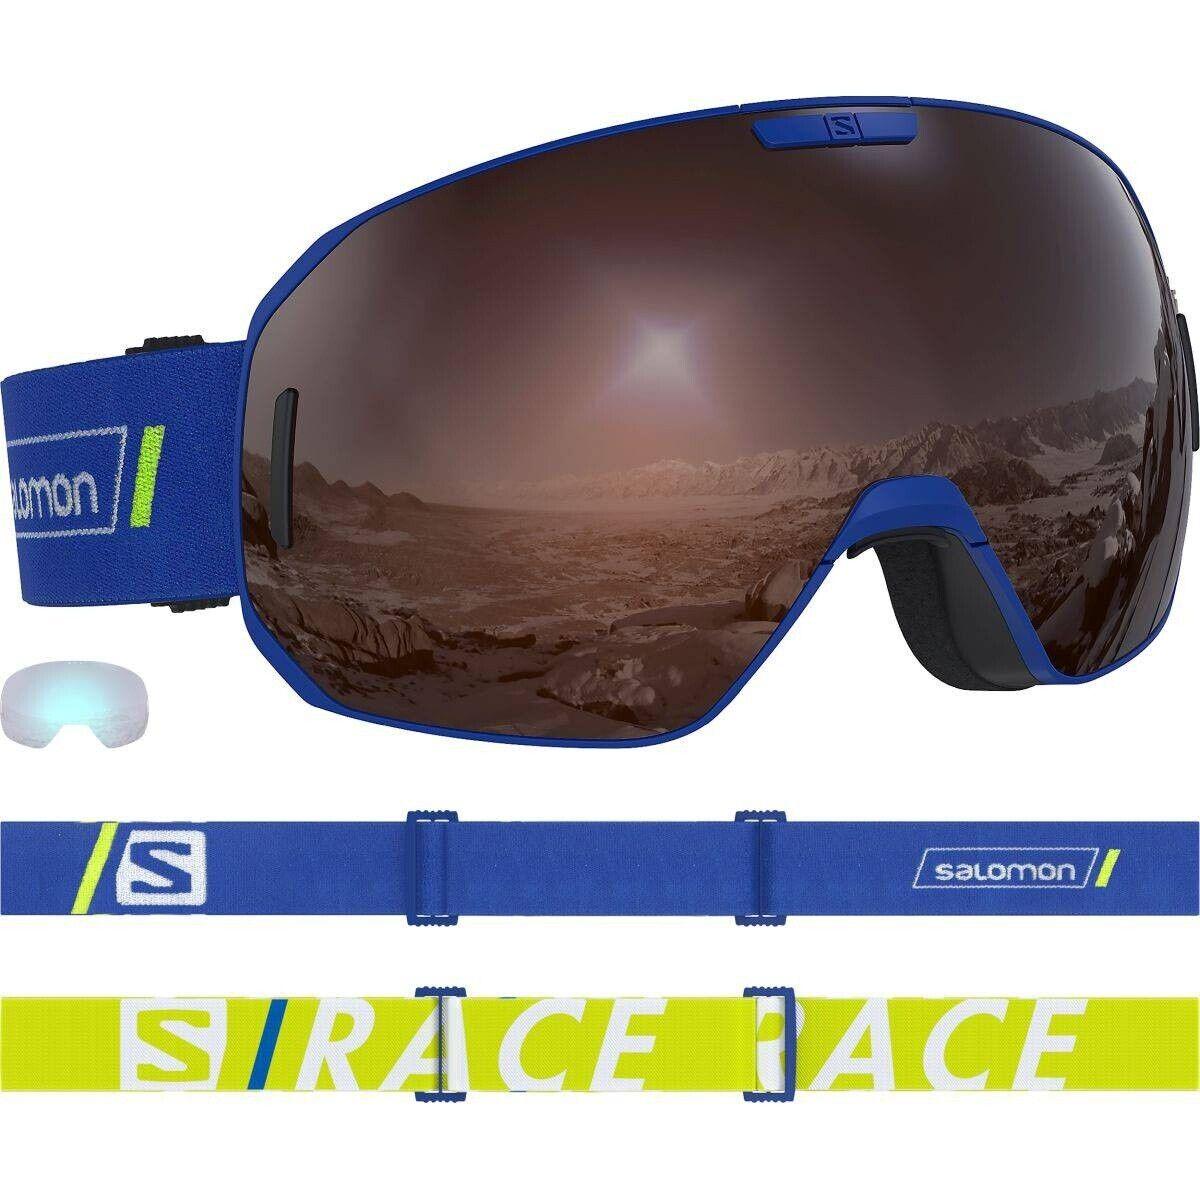 Salomon S Max Race Skibrille blau